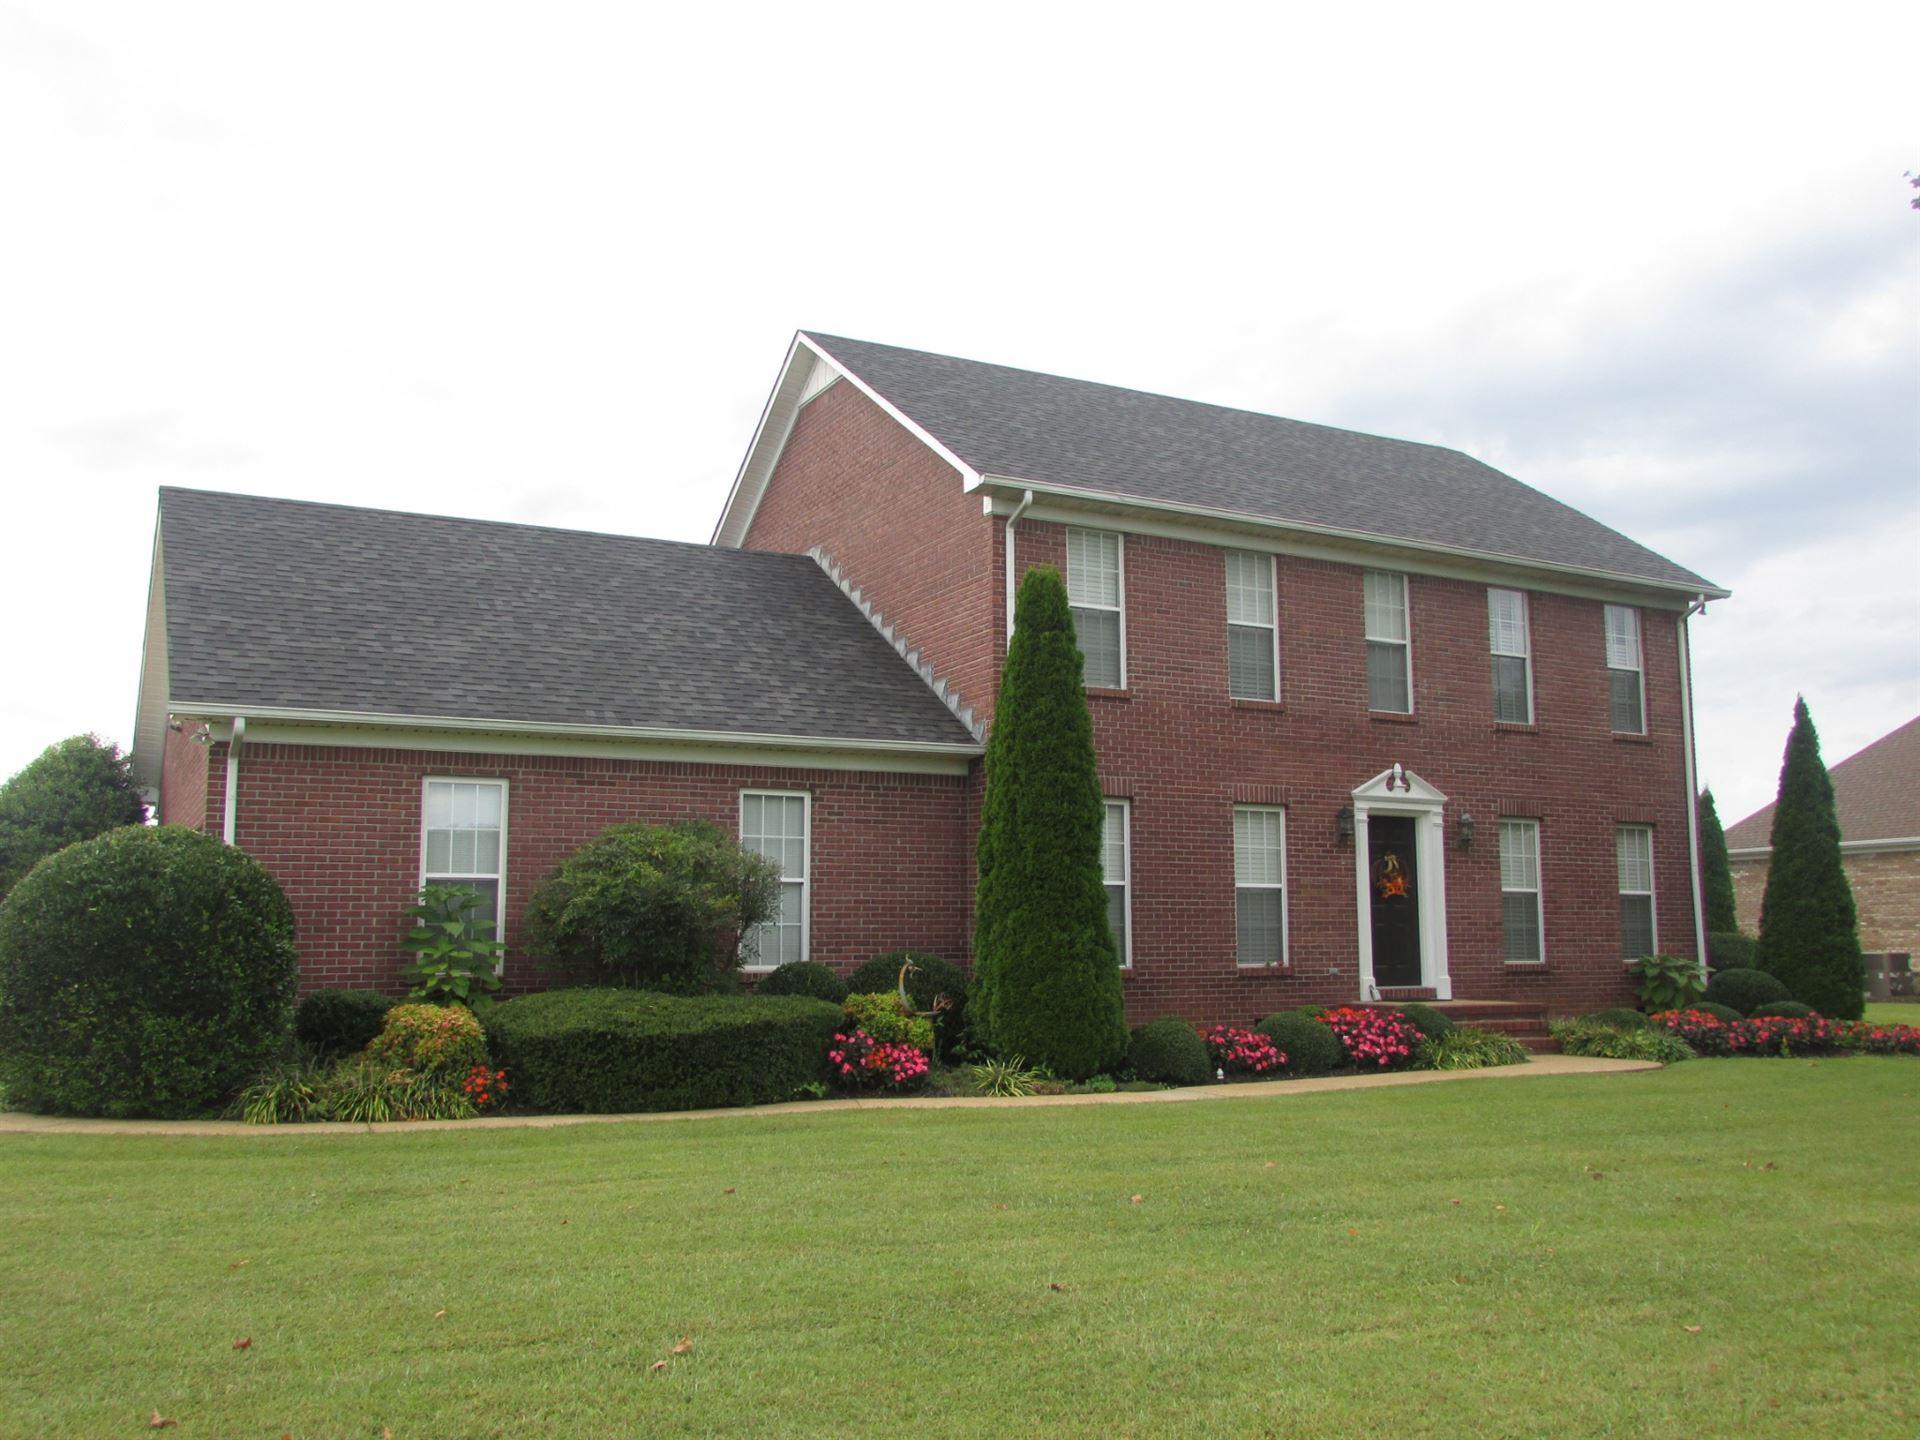 483 Annie Rooney Rd S, Lawrenceburg, TN 38464 - MLS#: 2262736